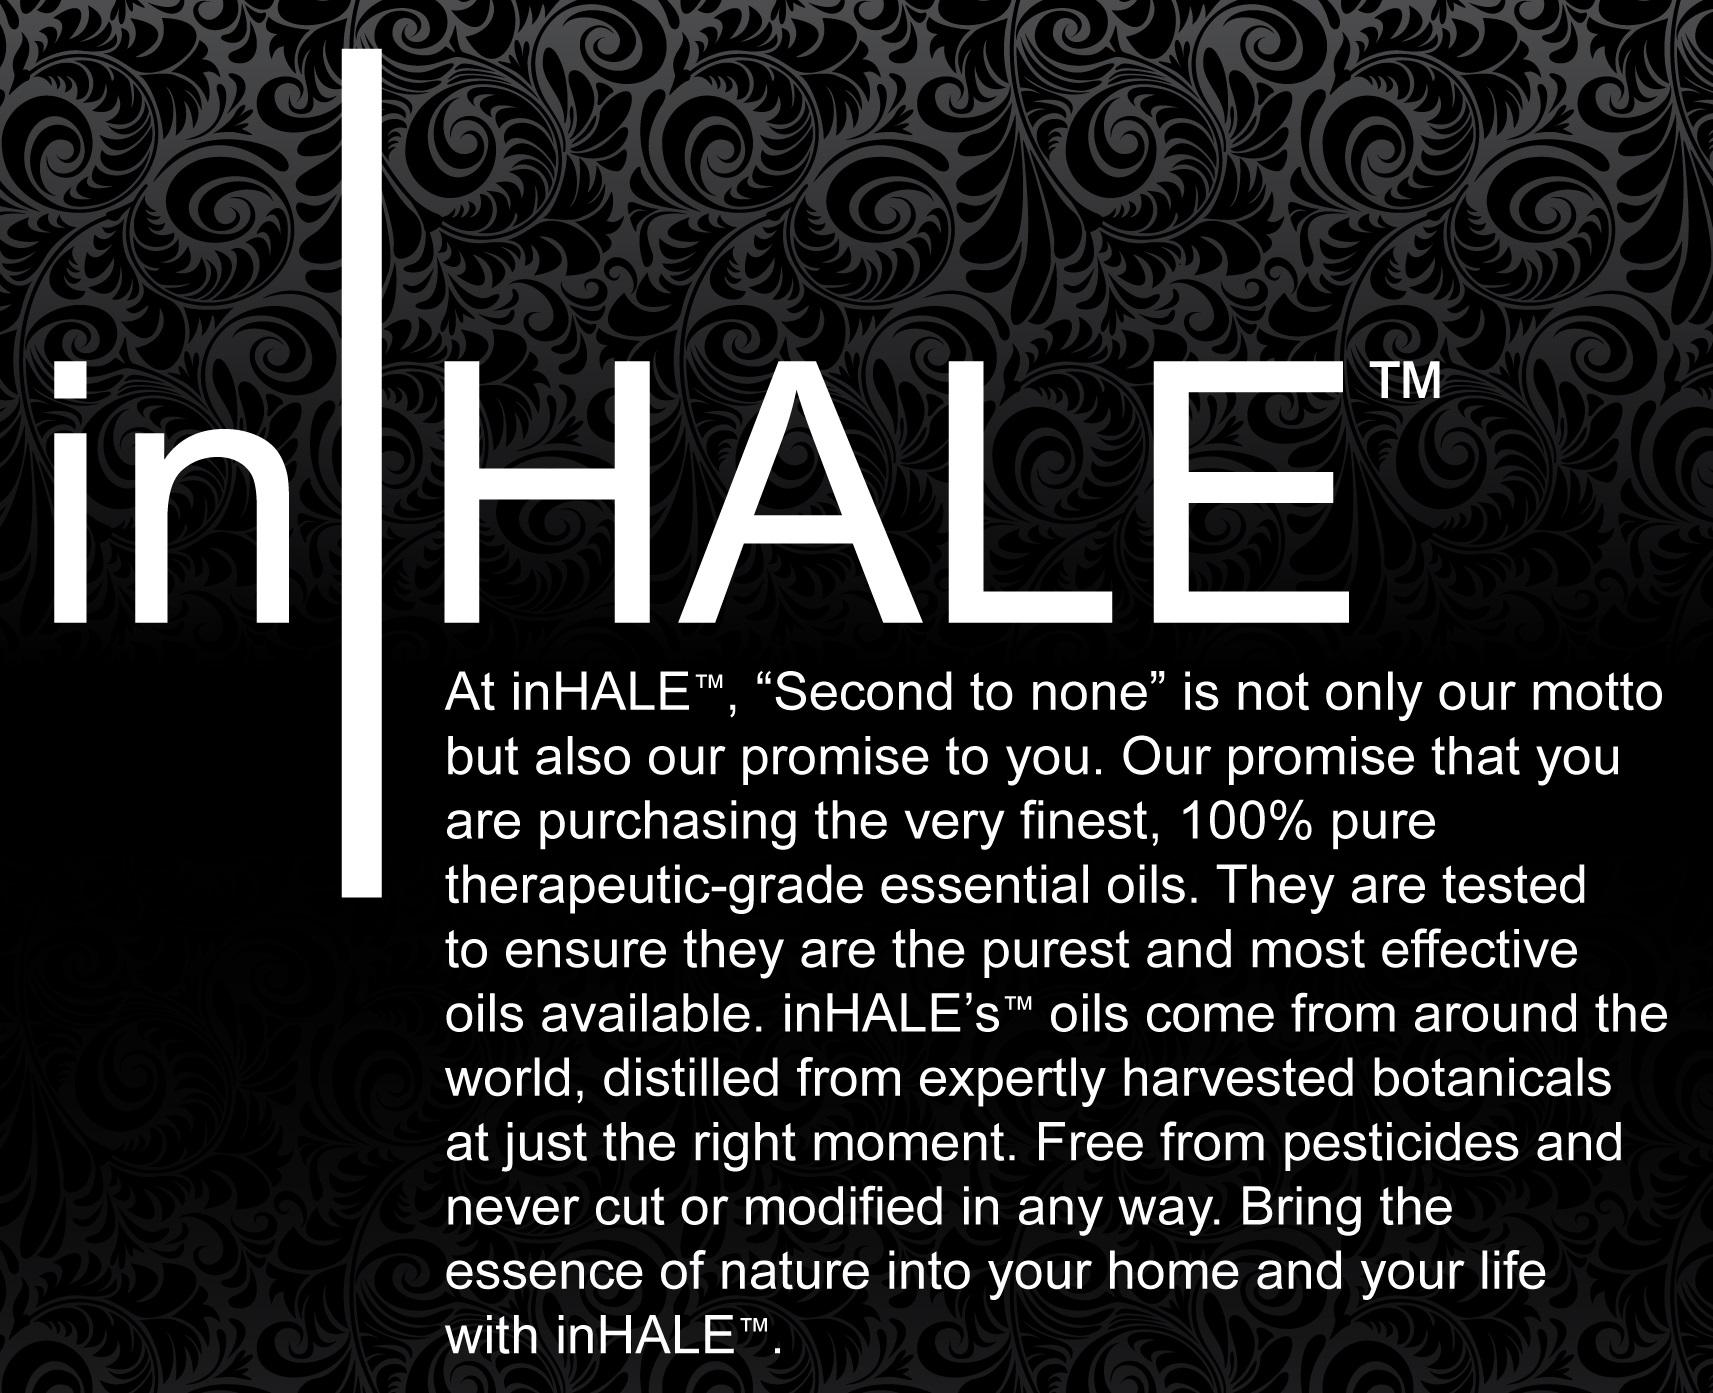 inhale-cropped.jpg